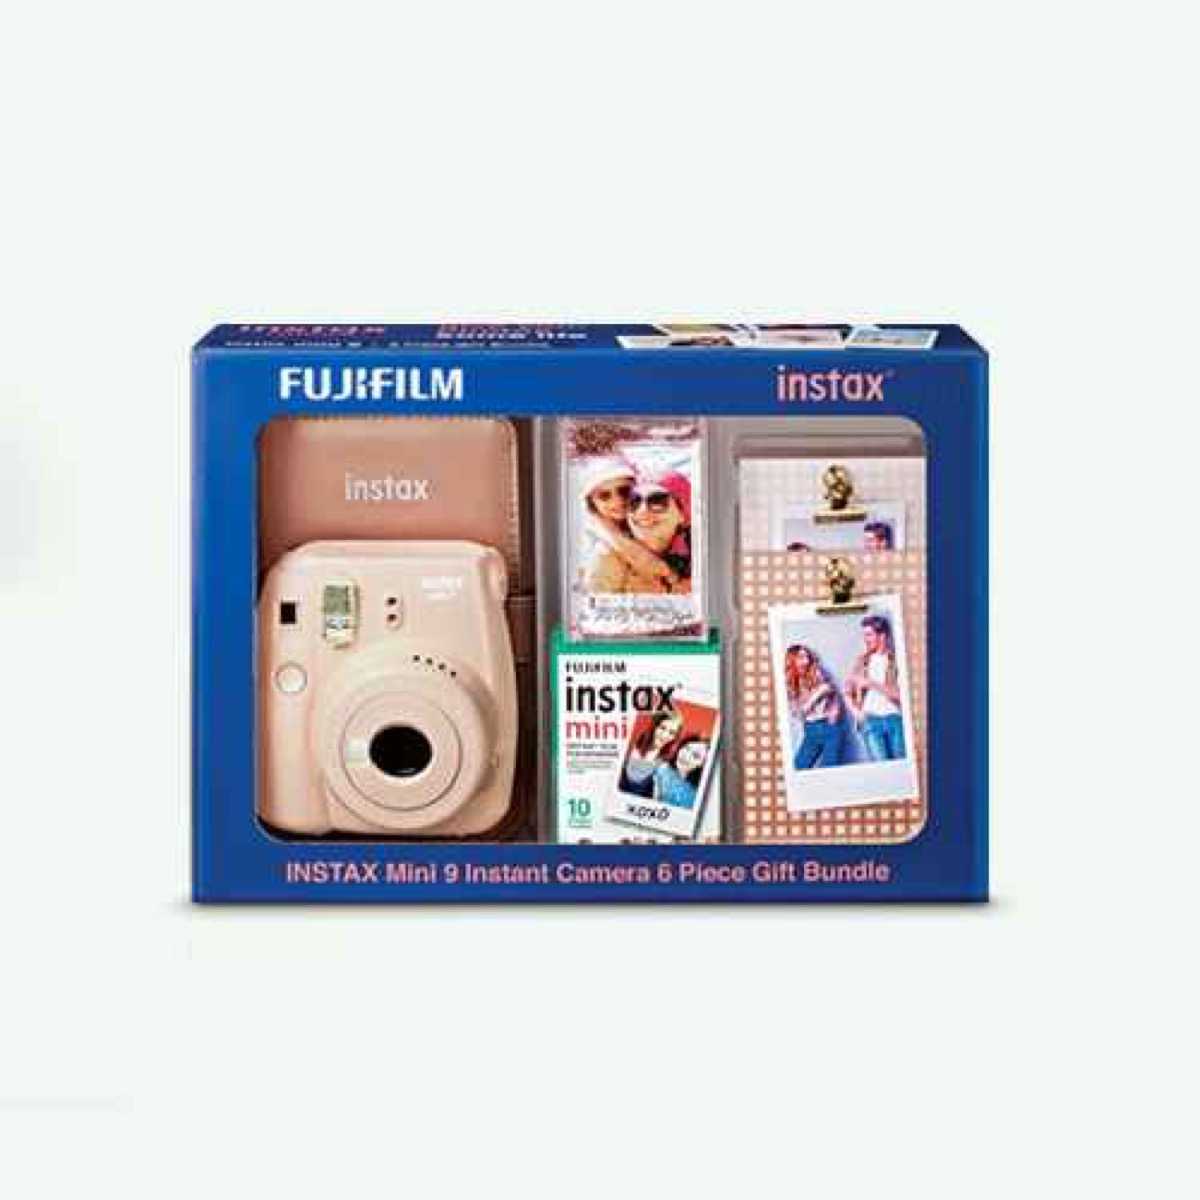 pink fujifilm instax camera and film